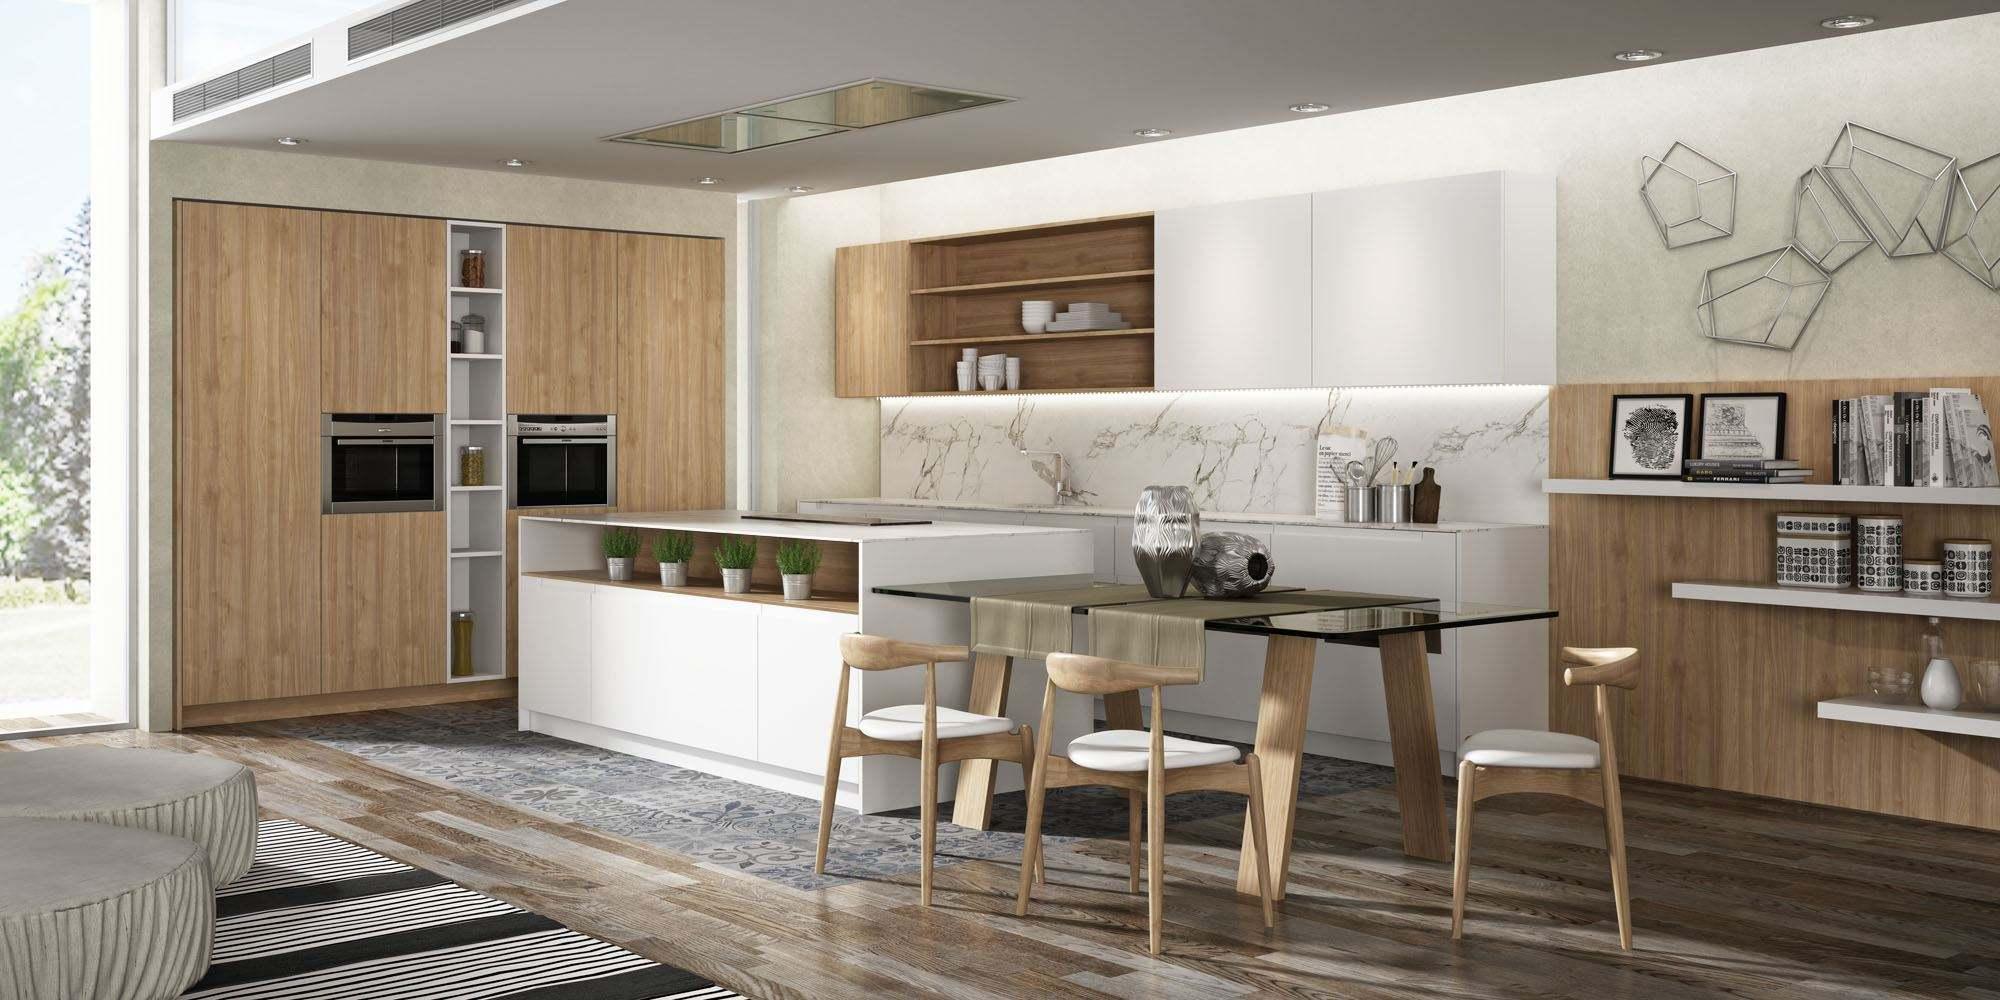 Inicio cocinas guzm n - Housing and interior design lesson plans ...